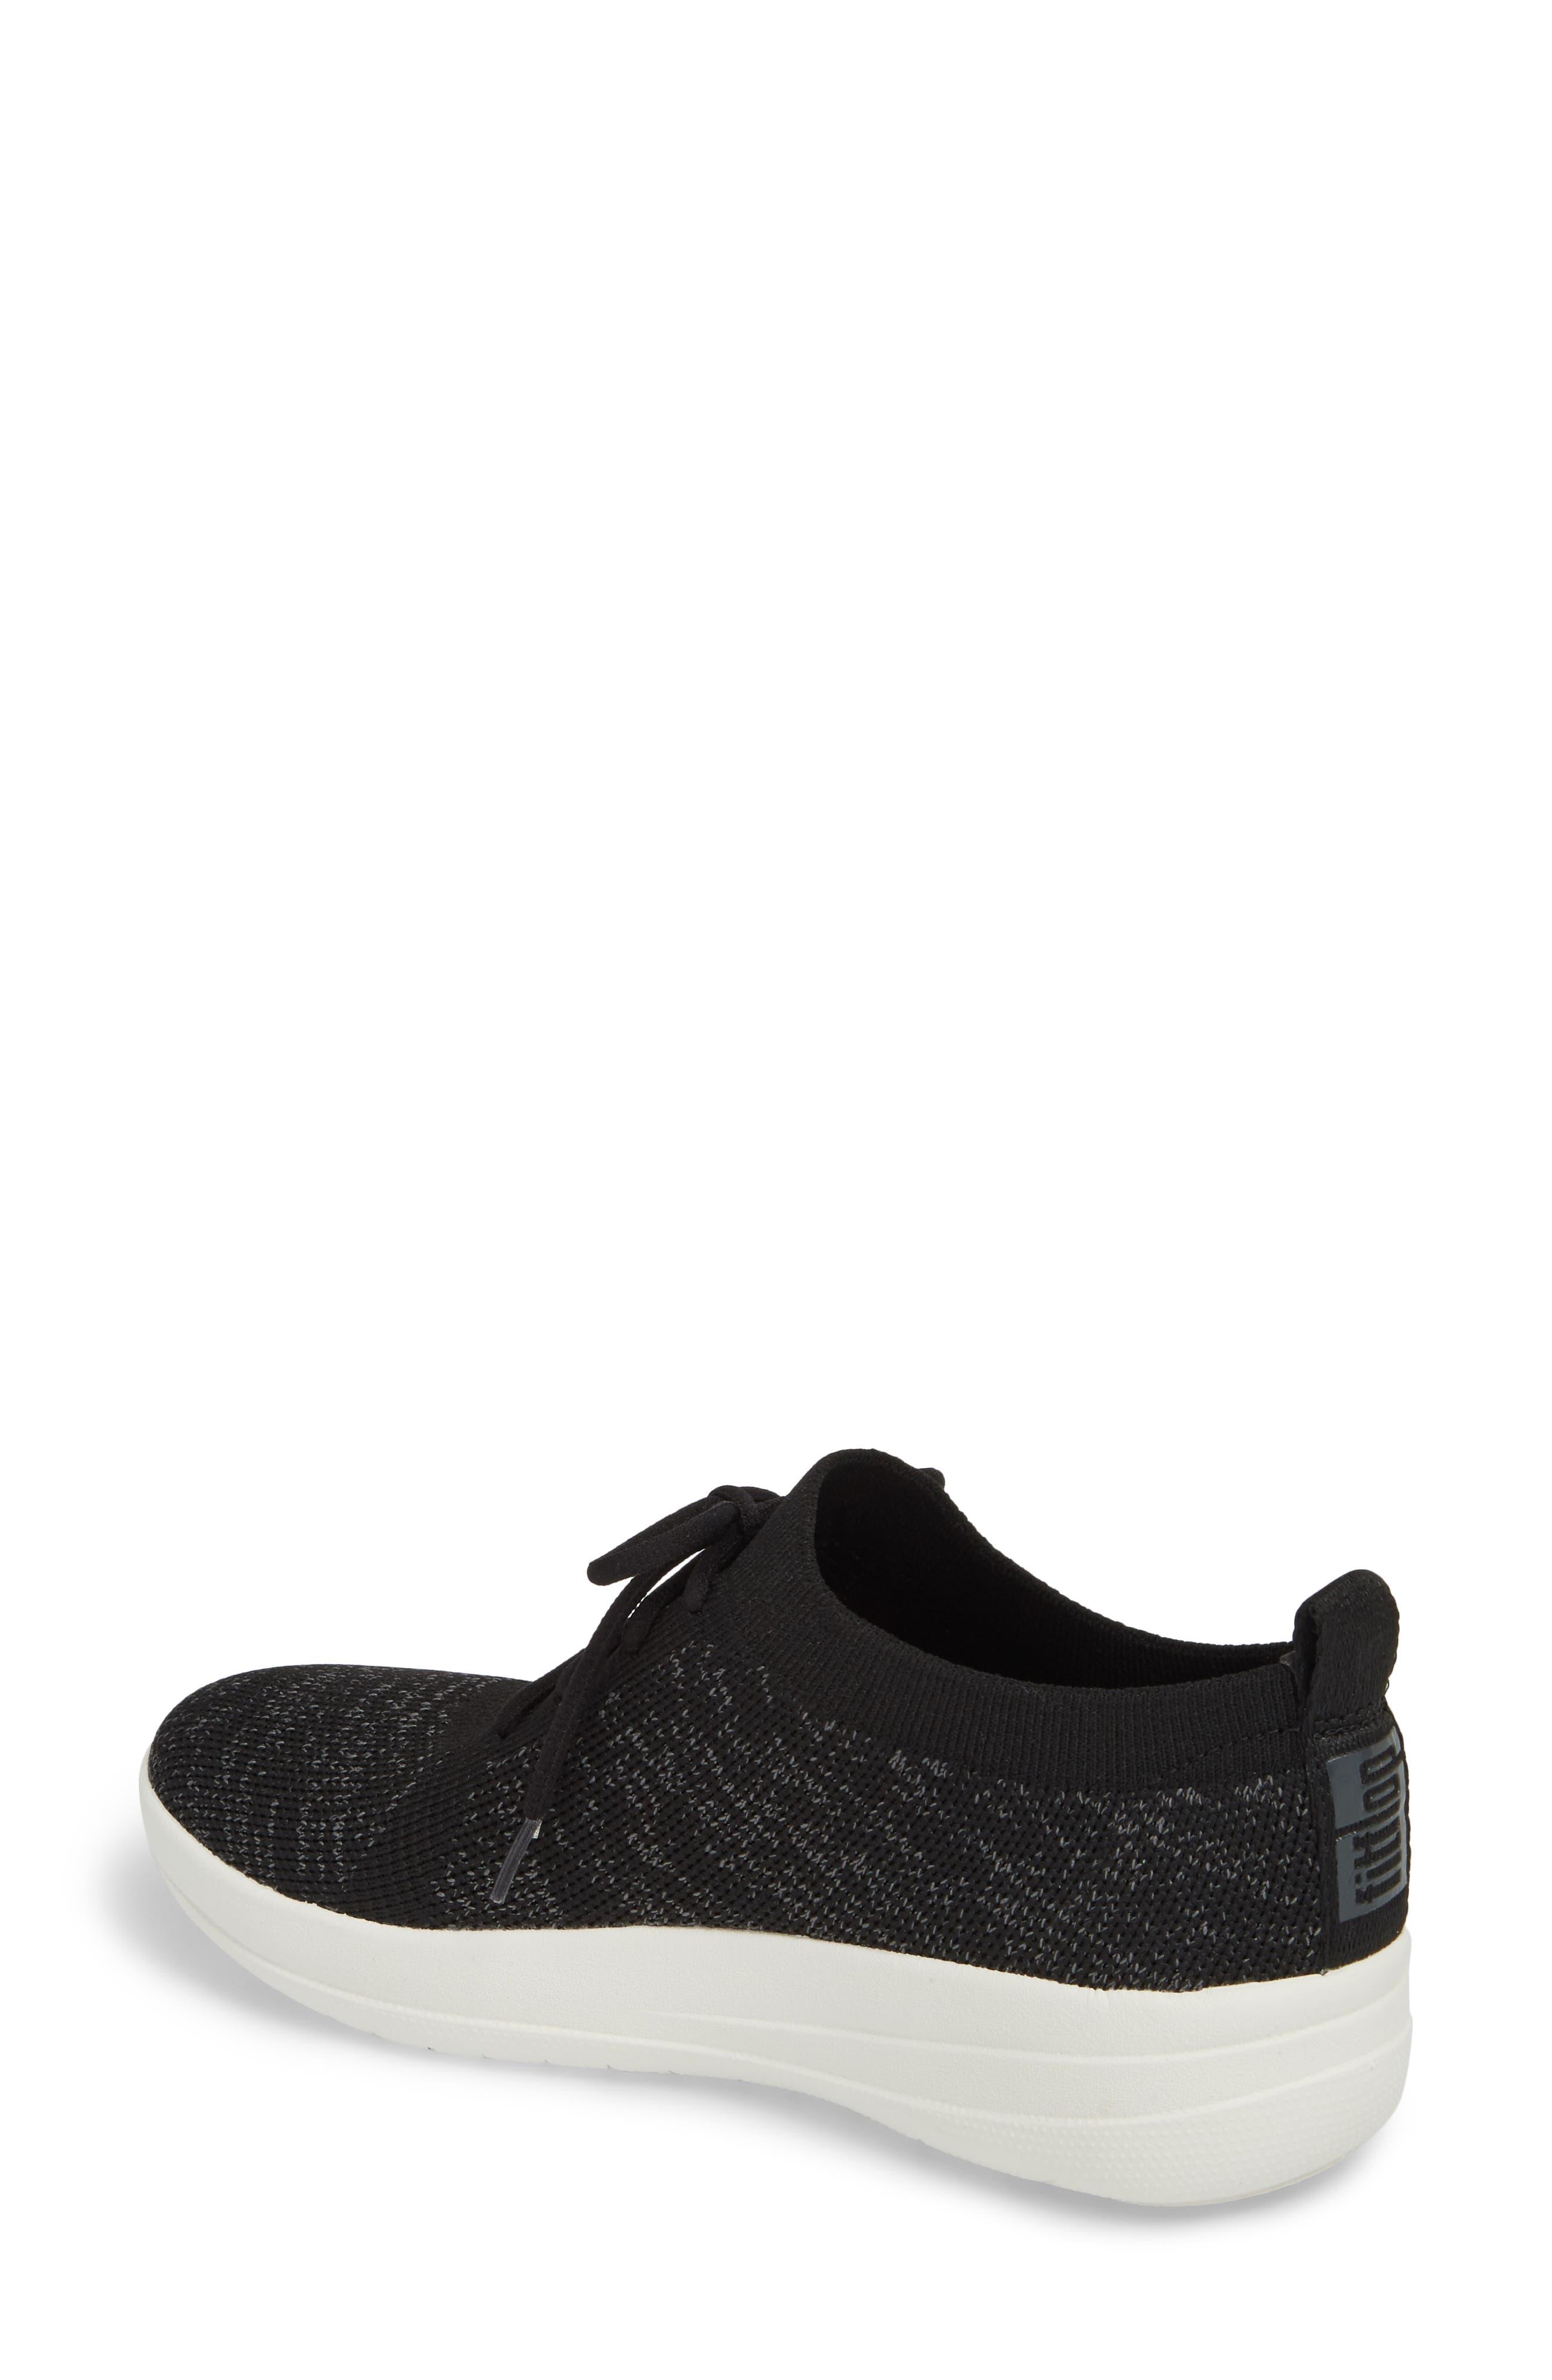 FITFLOP,                             F-Sporty Uberknit<sup>™</sup> Sneaker,                             Alternate thumbnail 2, color,                             BLACK